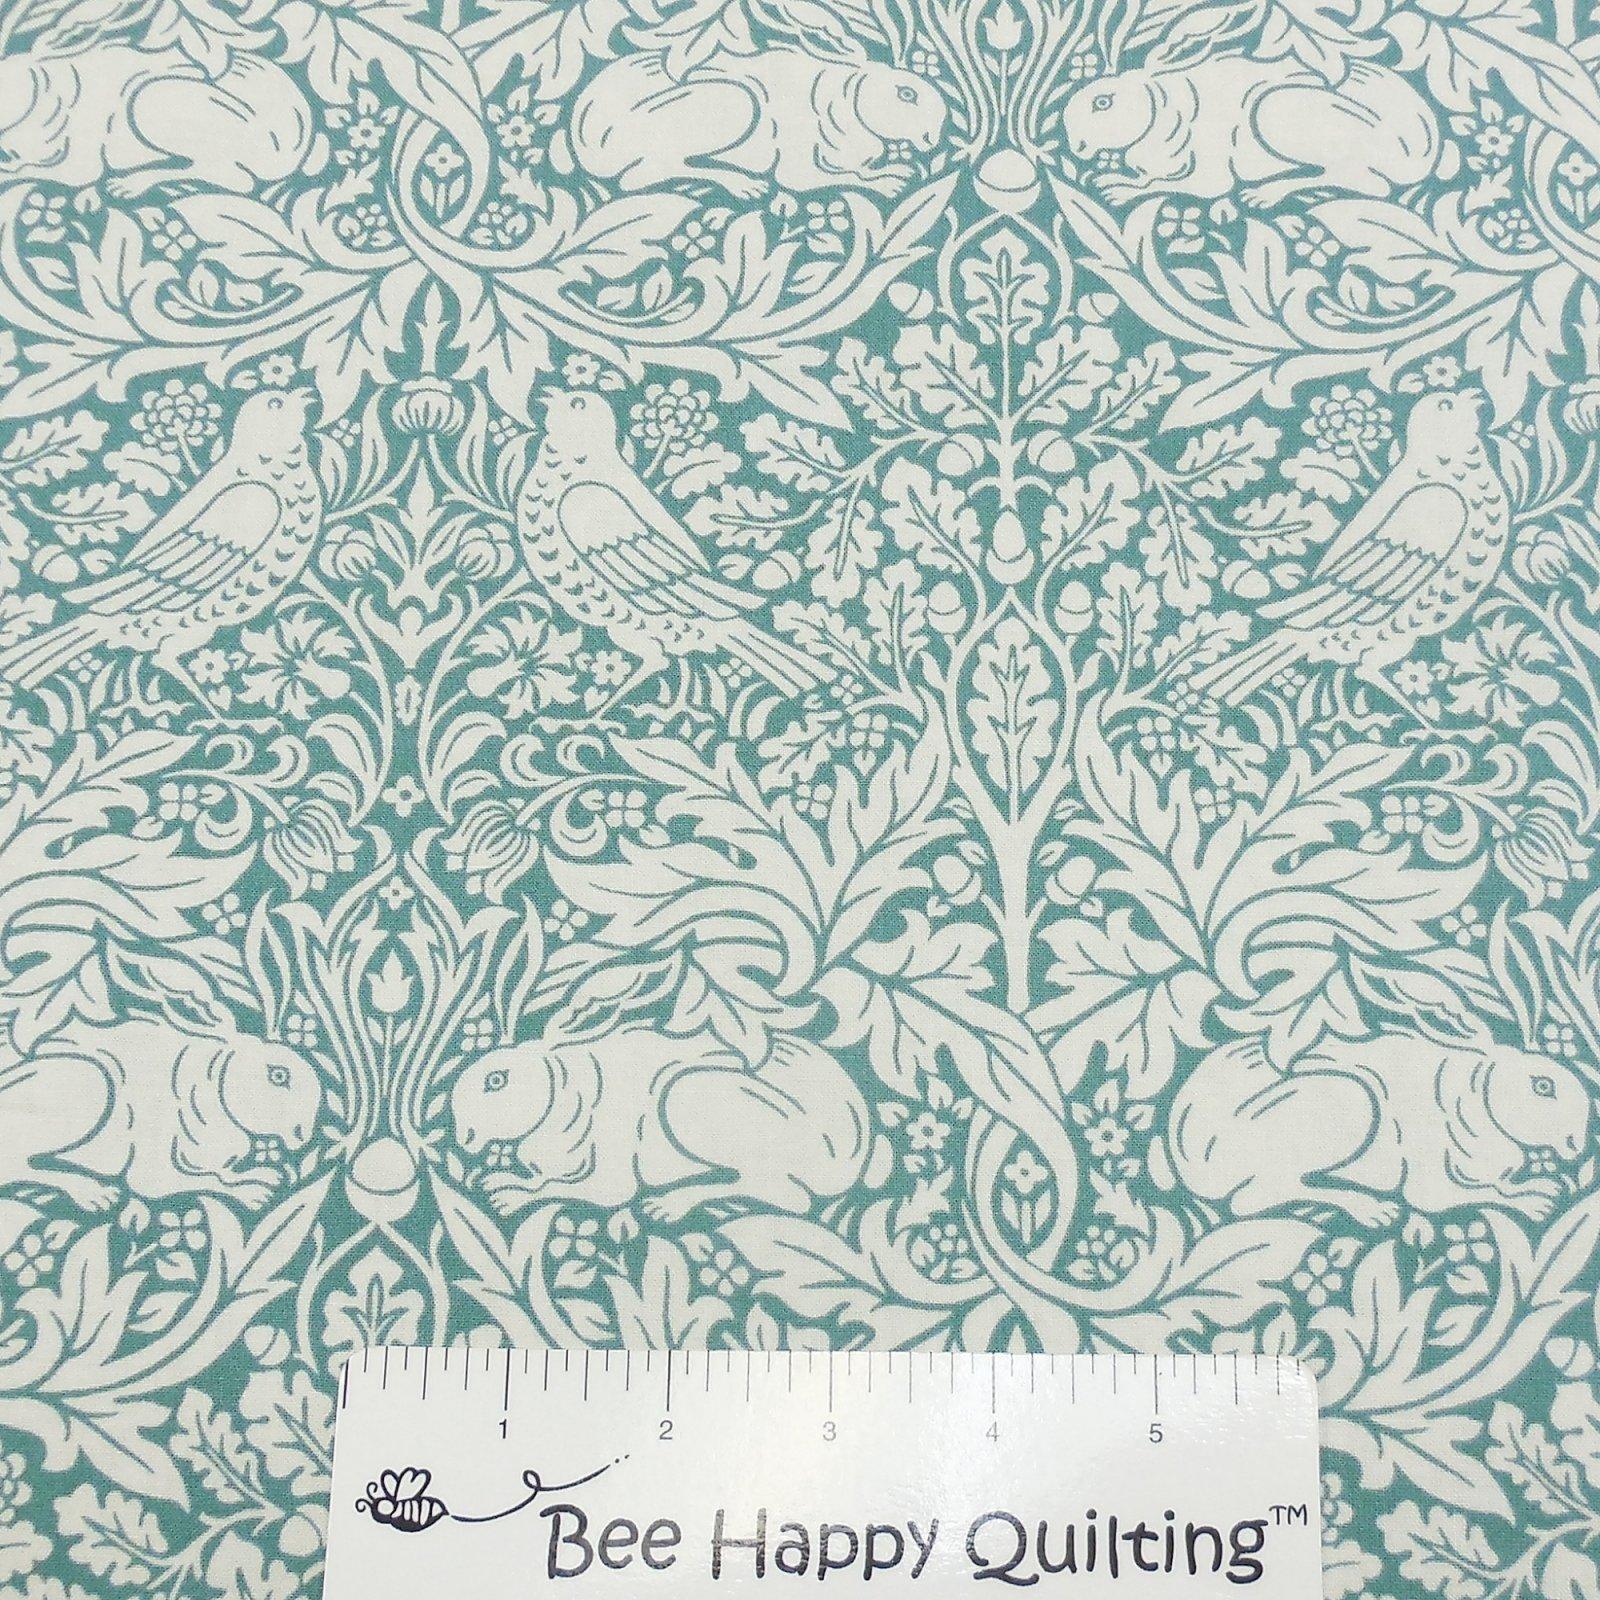 Brer Rabbit Fabric Morris & Co - Teal PWWM026